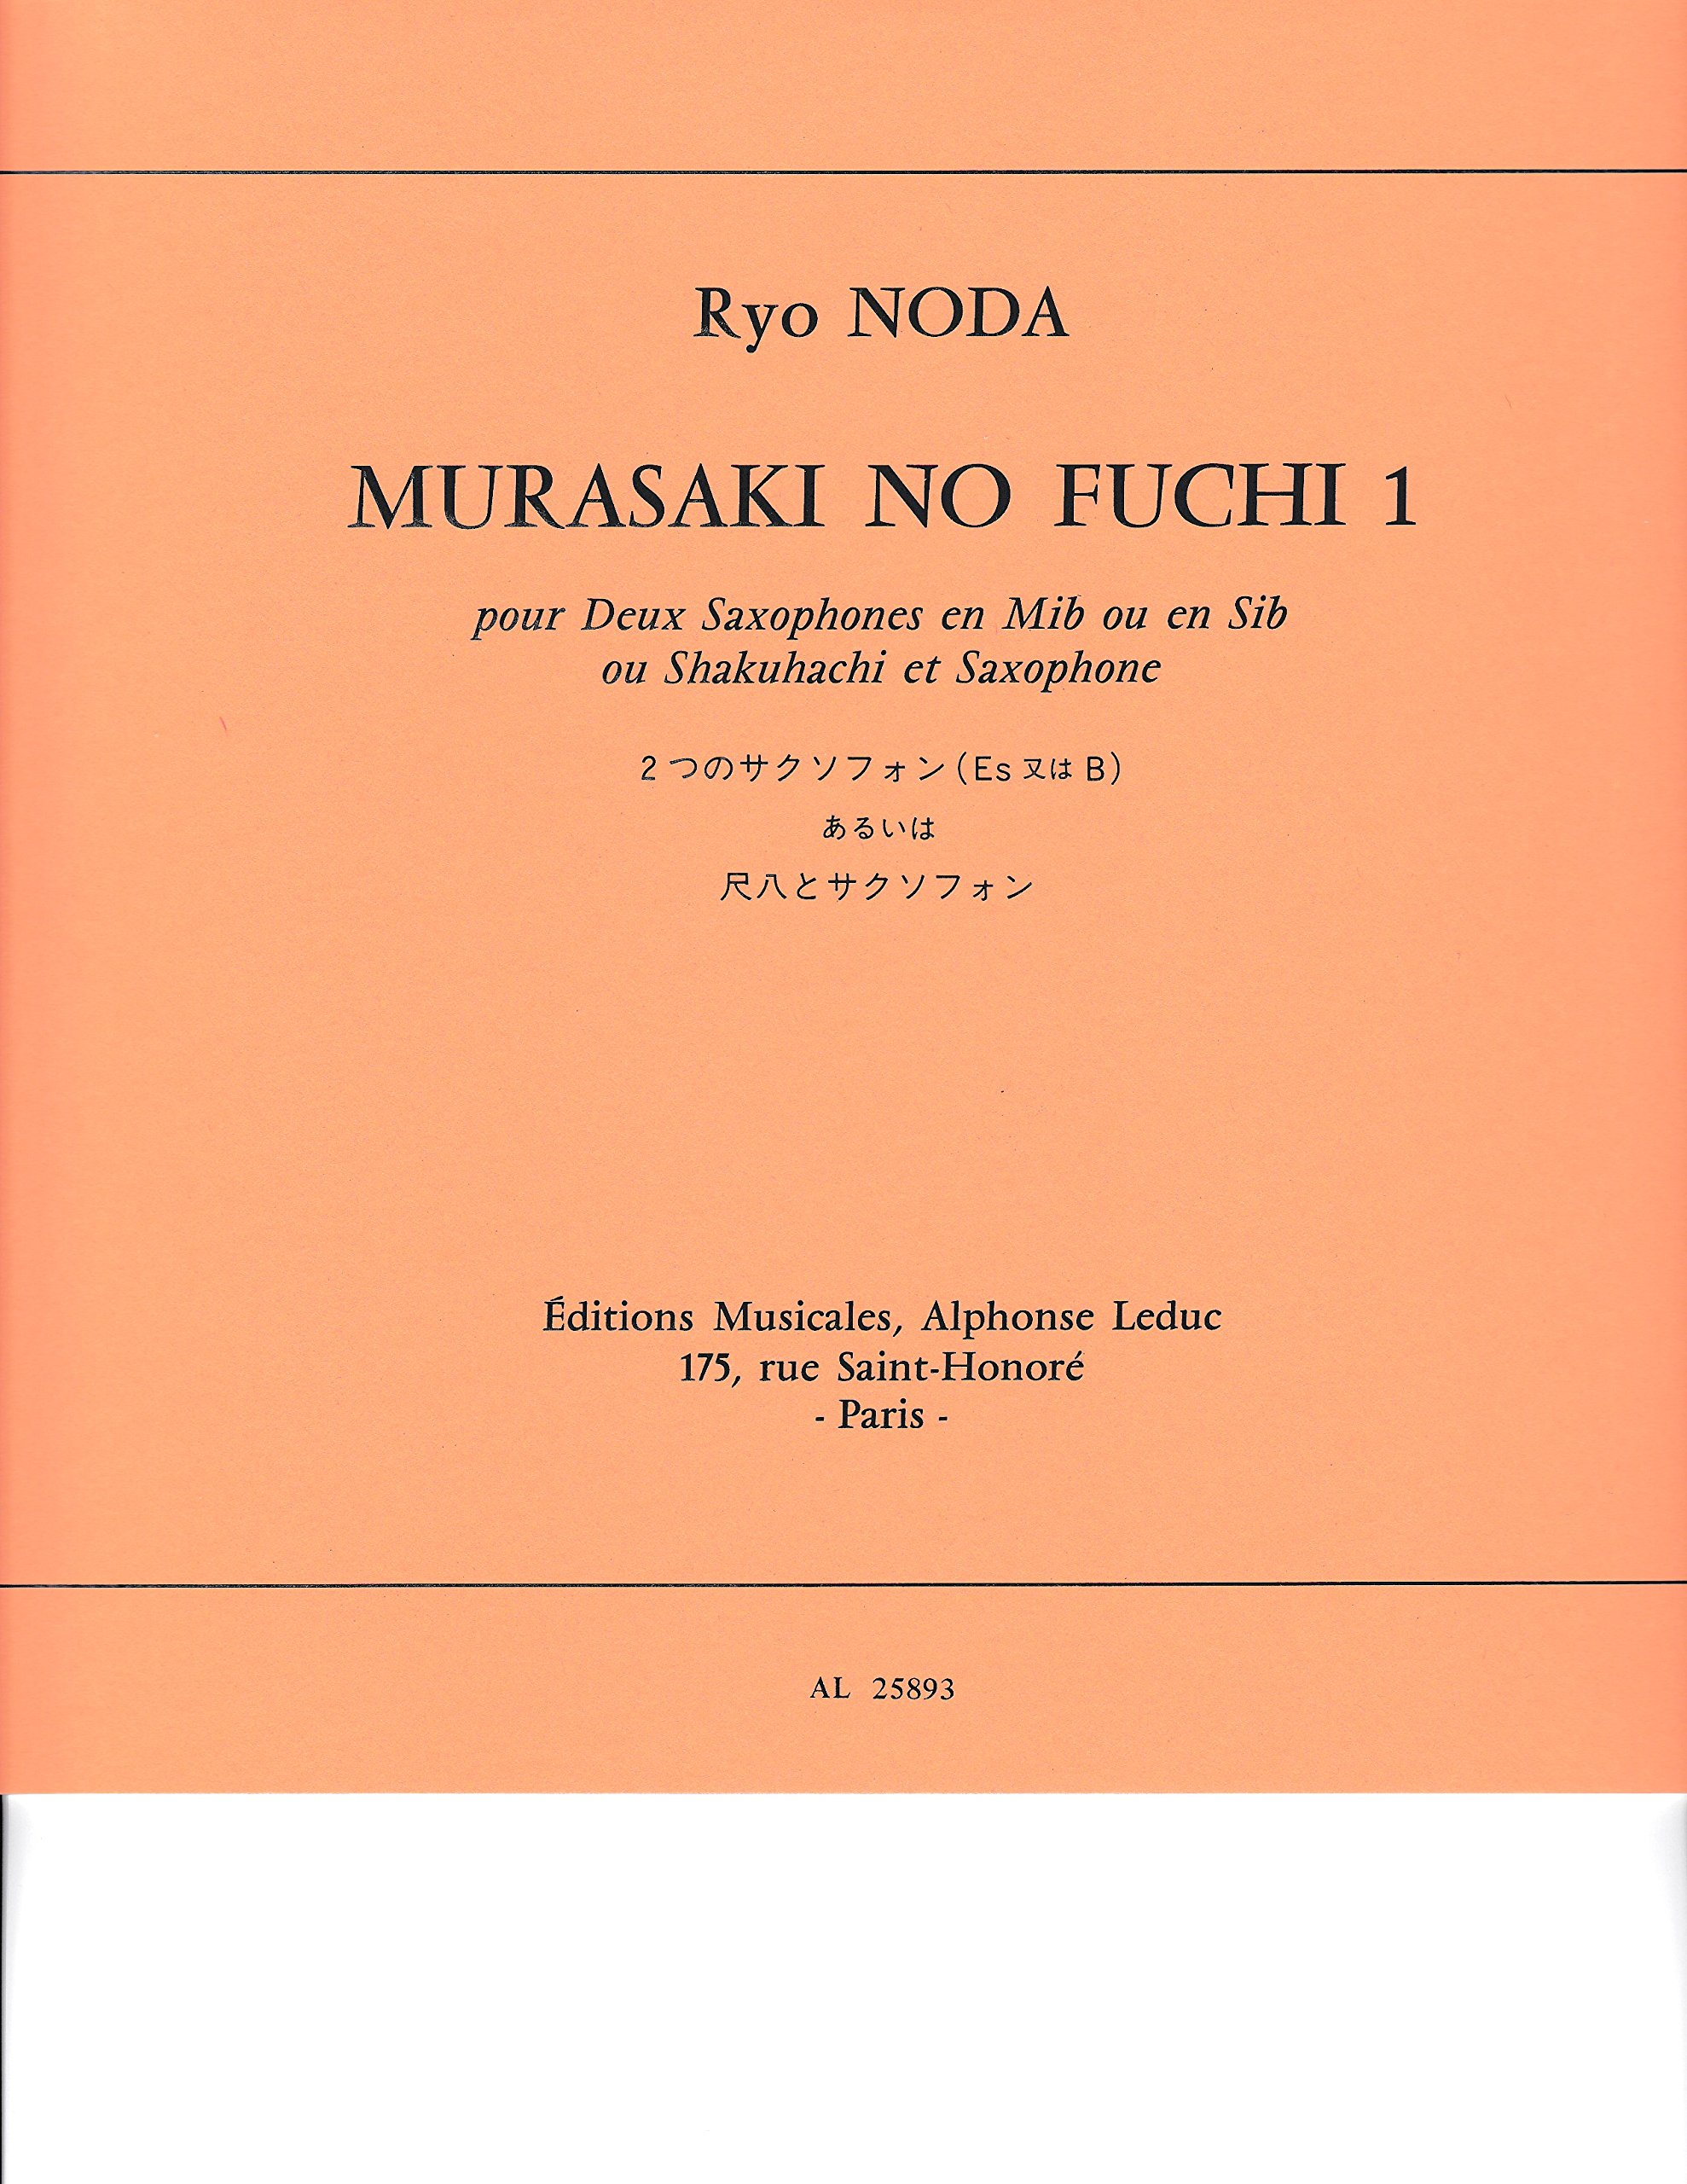 Murasaki No Fuchi for 2-Like Saxophones by Ryo Noda